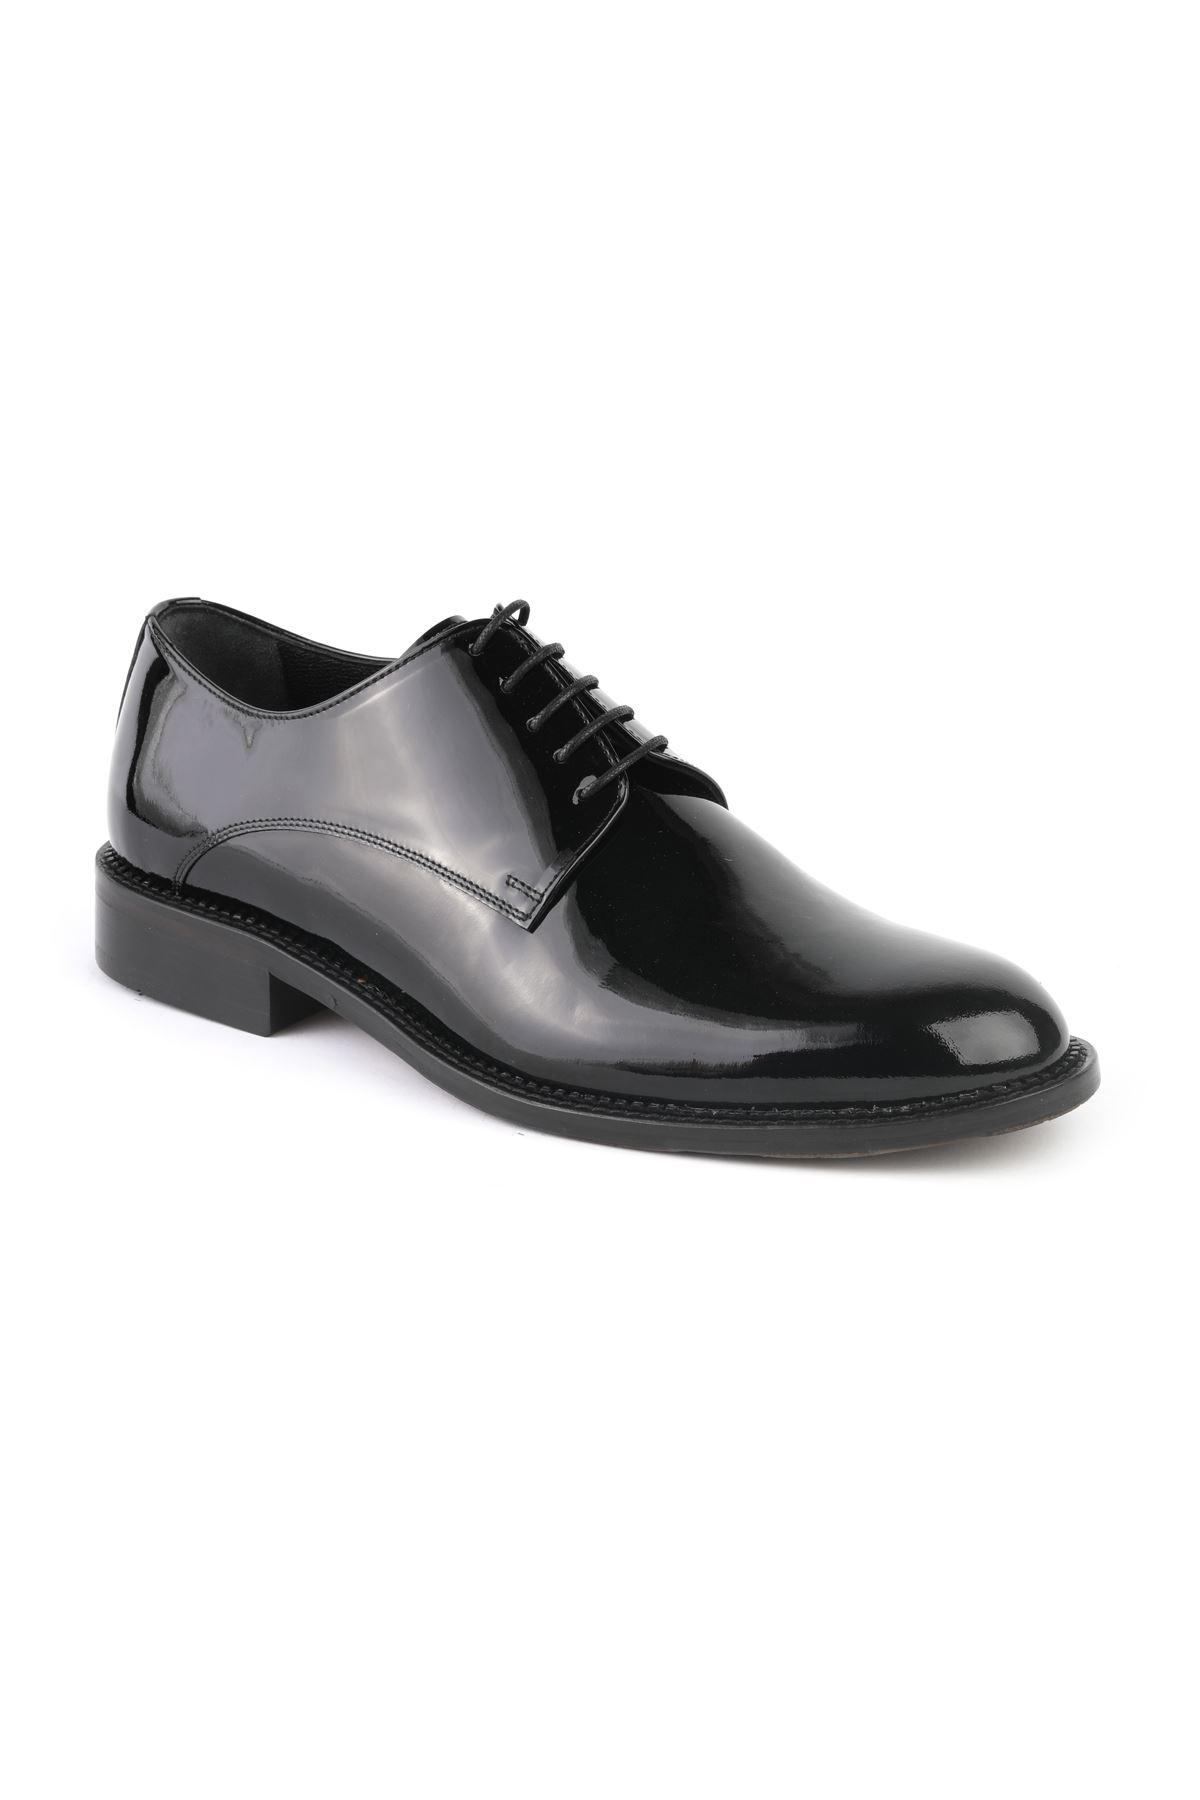 Libero T1243 Black Classic Shoes